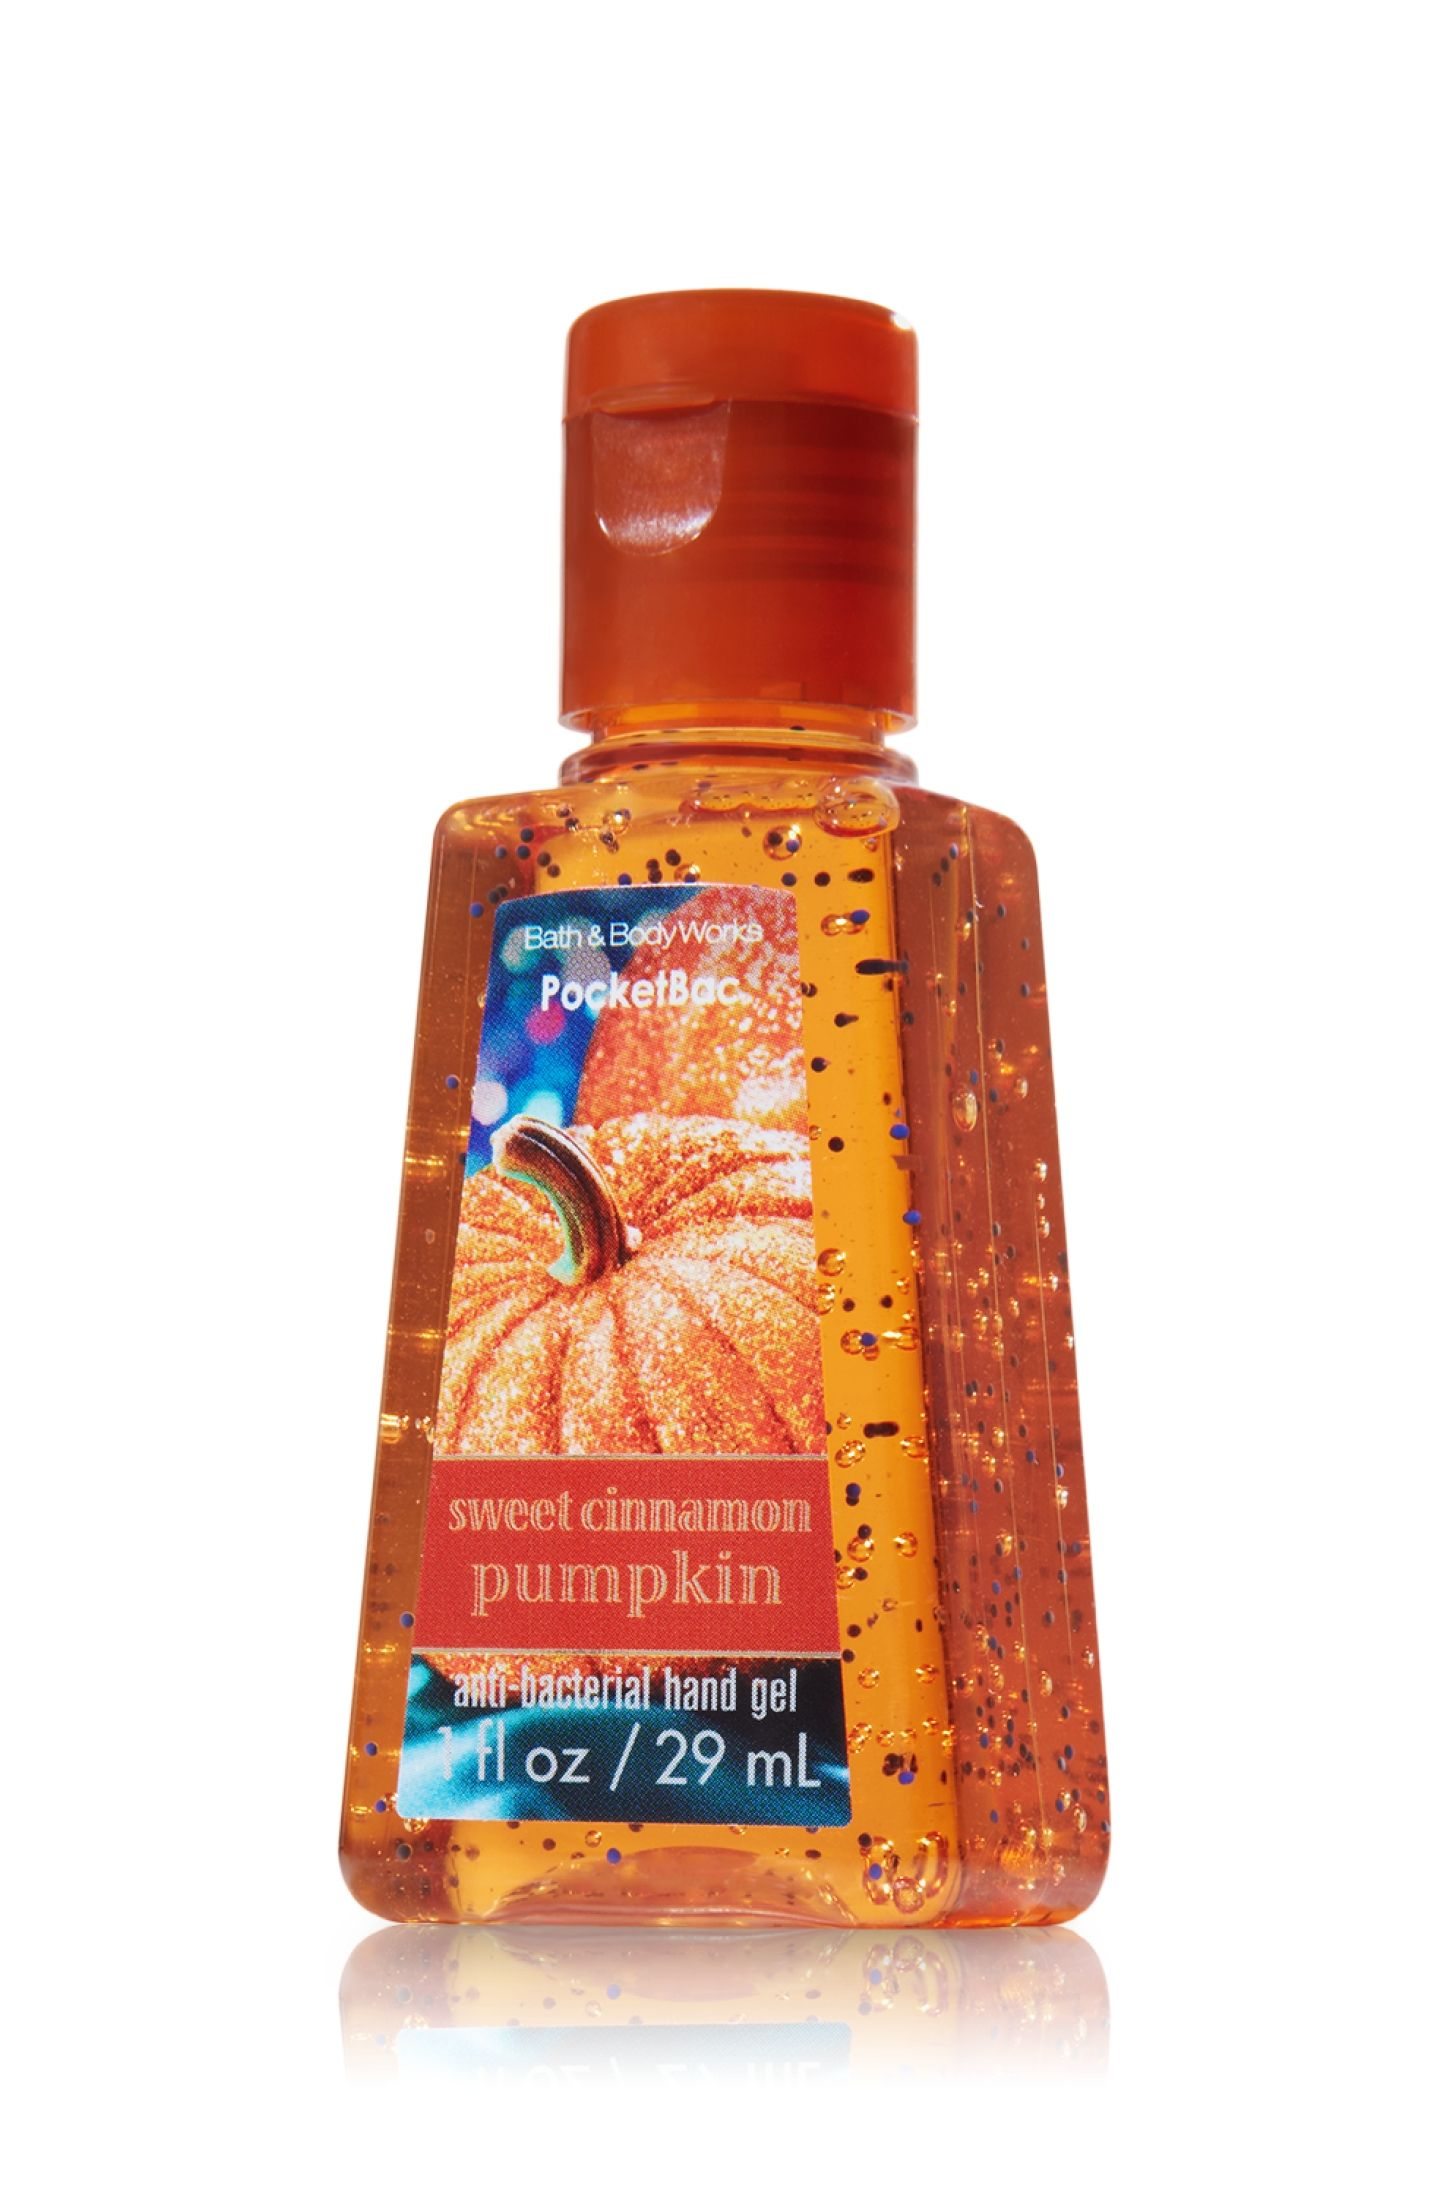 Sweet Cinnamon Pumpkin Pocketbac Anti Bacterial Bath Body